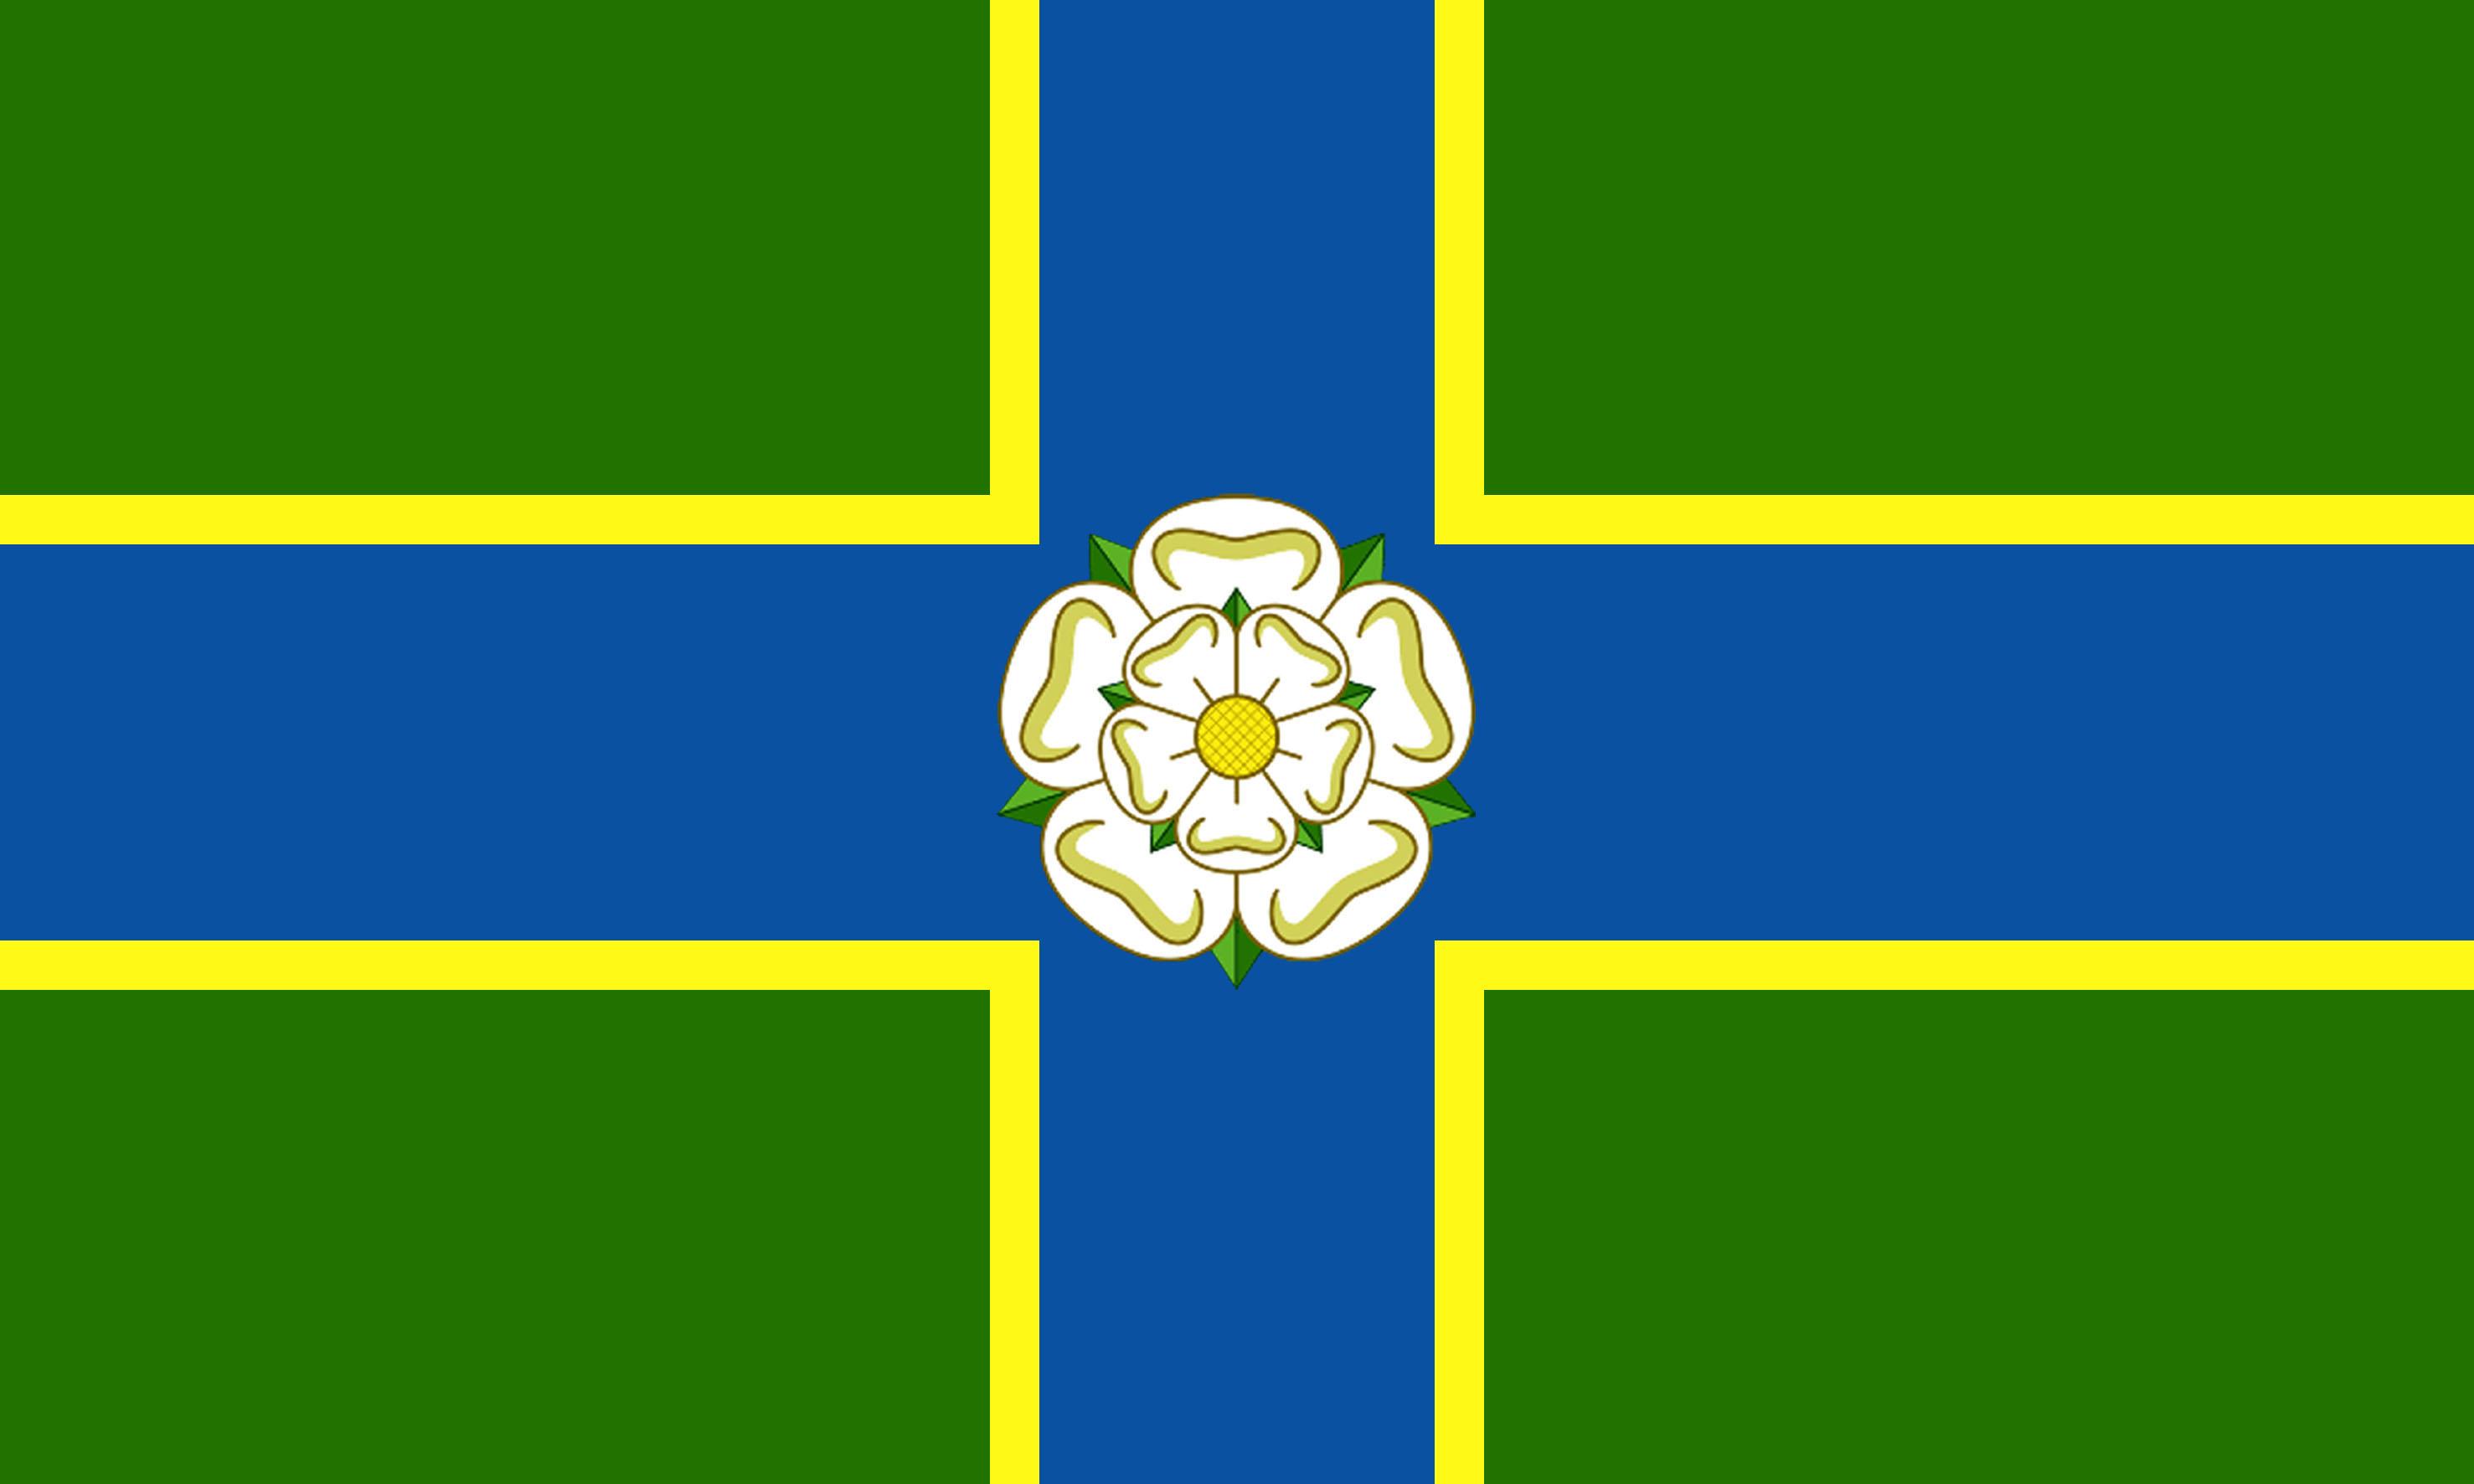 North Riding Flag Winning Design Andy Strangeway - north flags